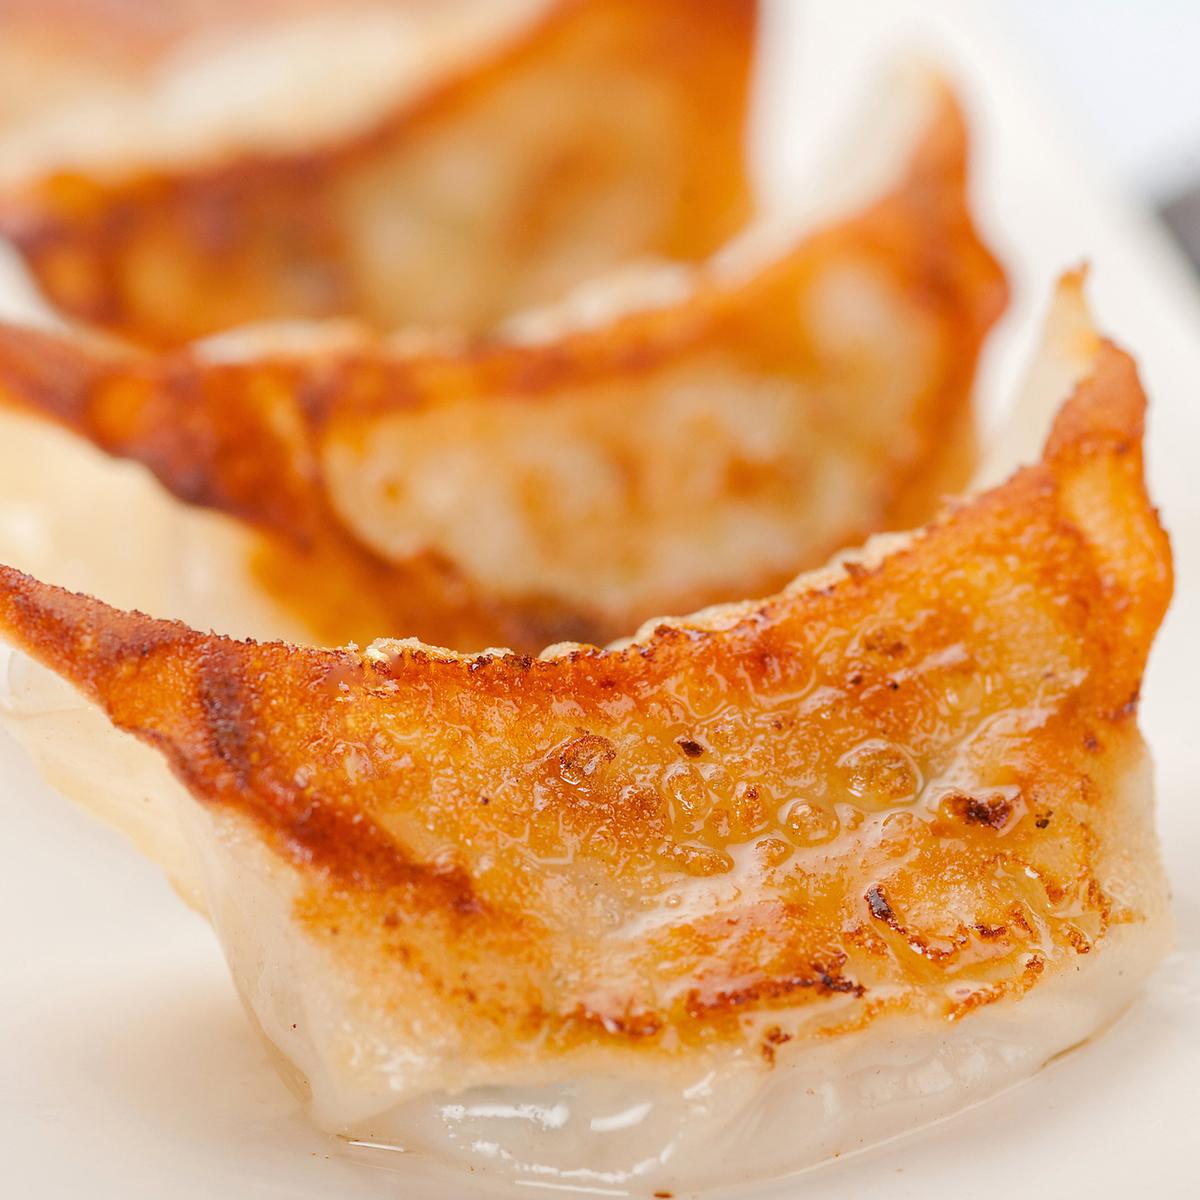 Gyoza dumplings (Garlic & Nila can also be ordered) 8 pieces